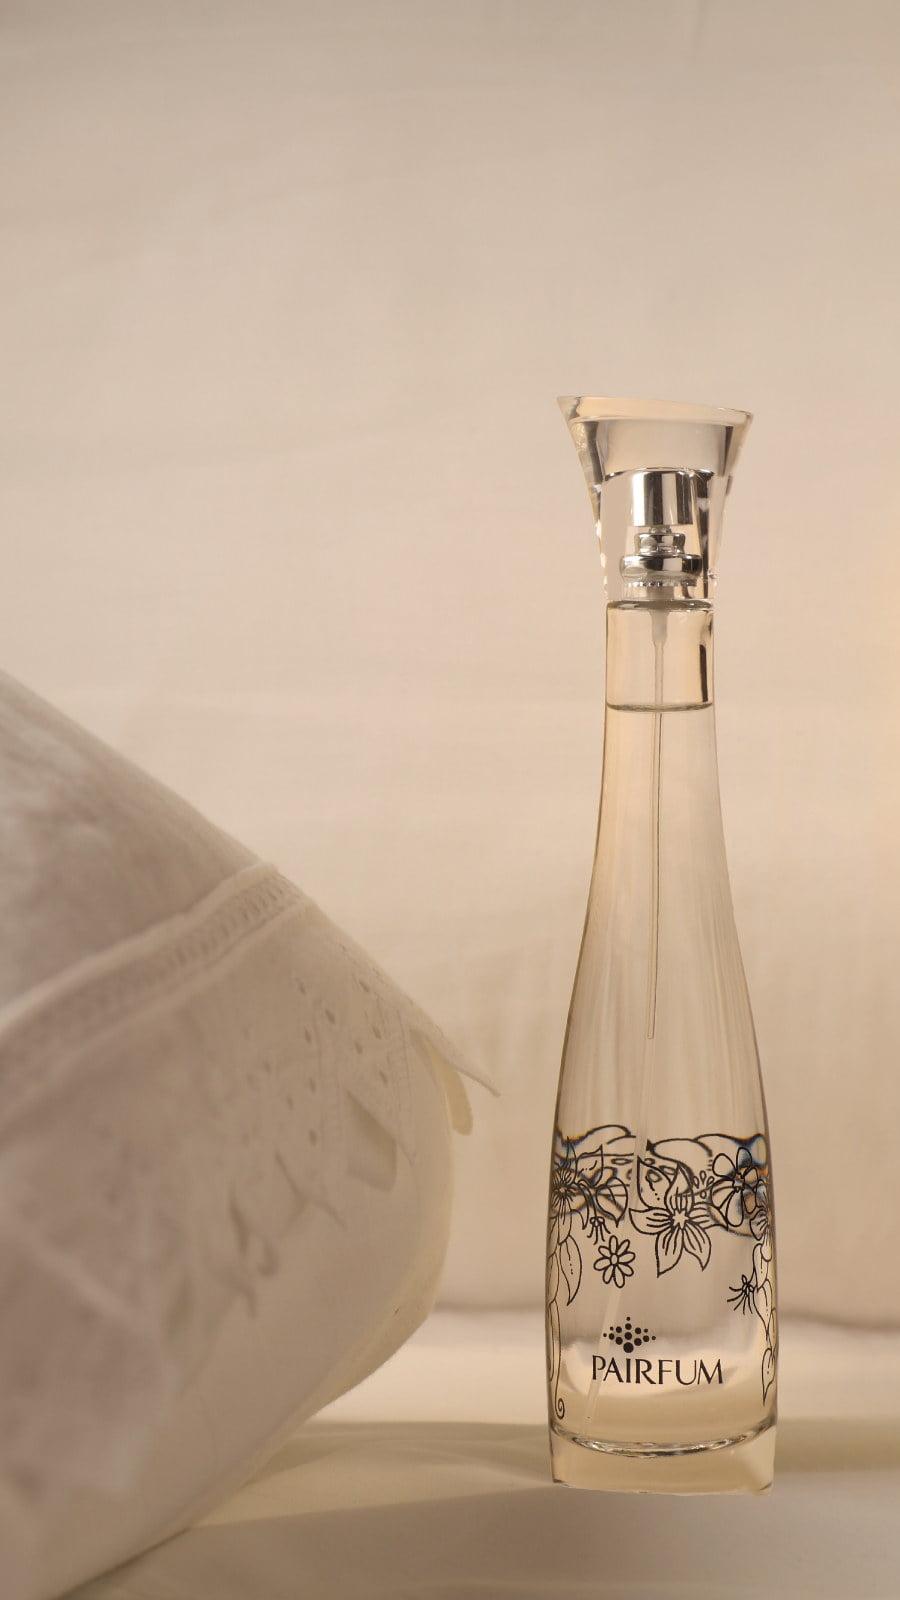 Lifestyle Bed Perfume Spray Linen Fabric Sleep Pillow 9 16